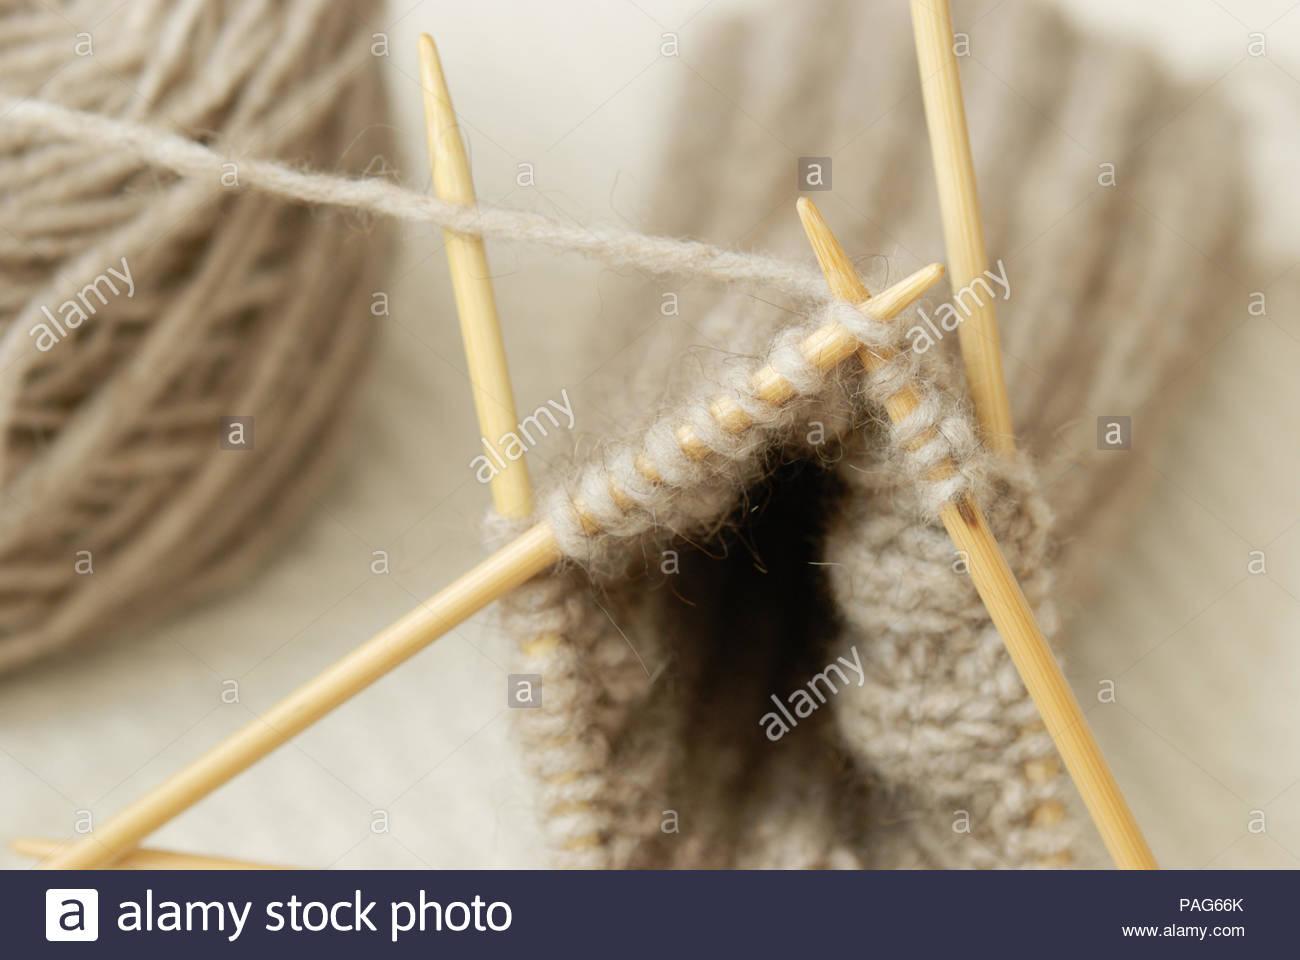 spool of yarn stock photos spool of yarn stock images alamy